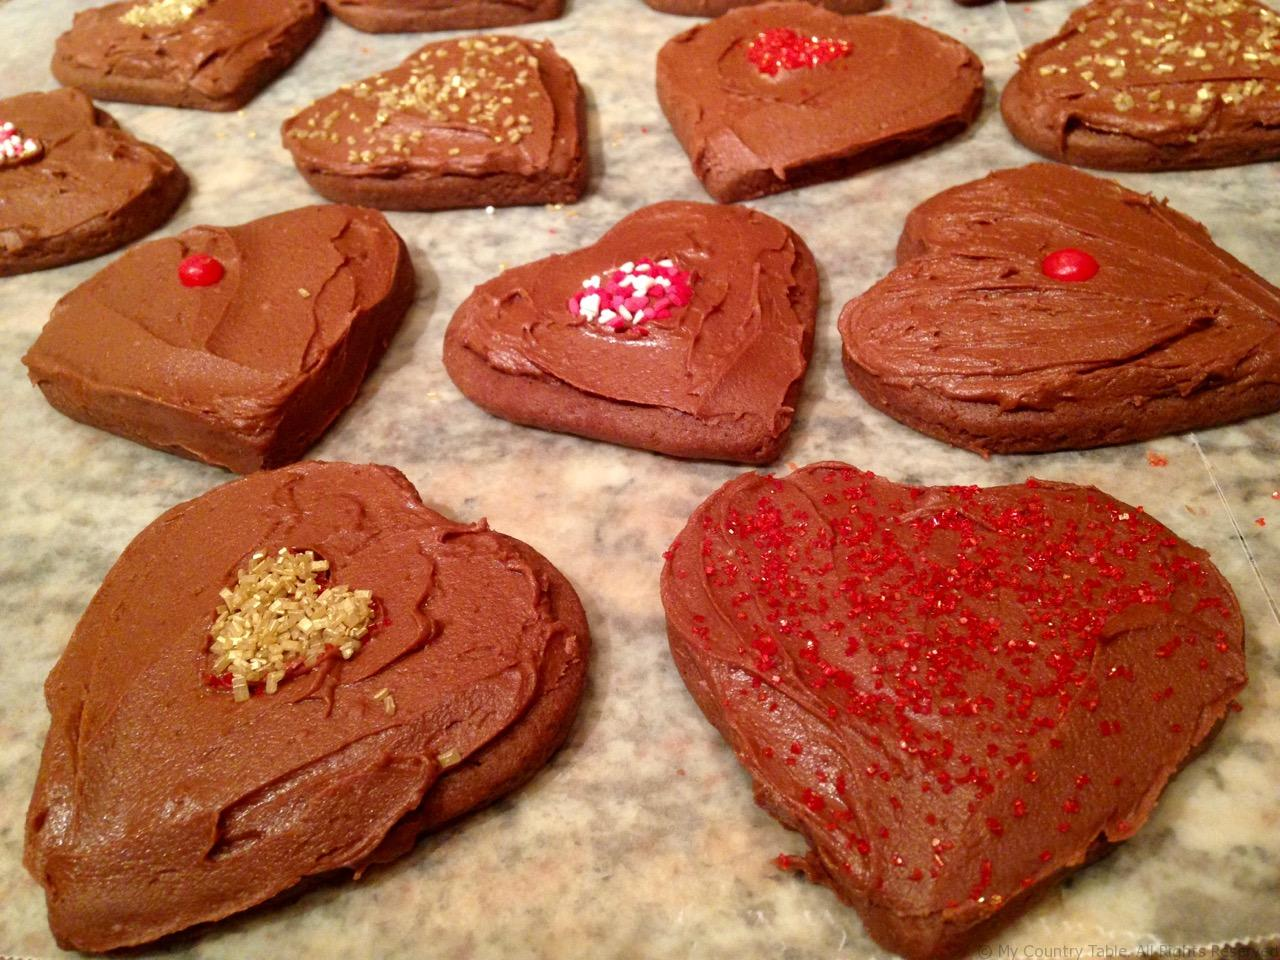 Chocolate Cocoa Shortbread Cookies